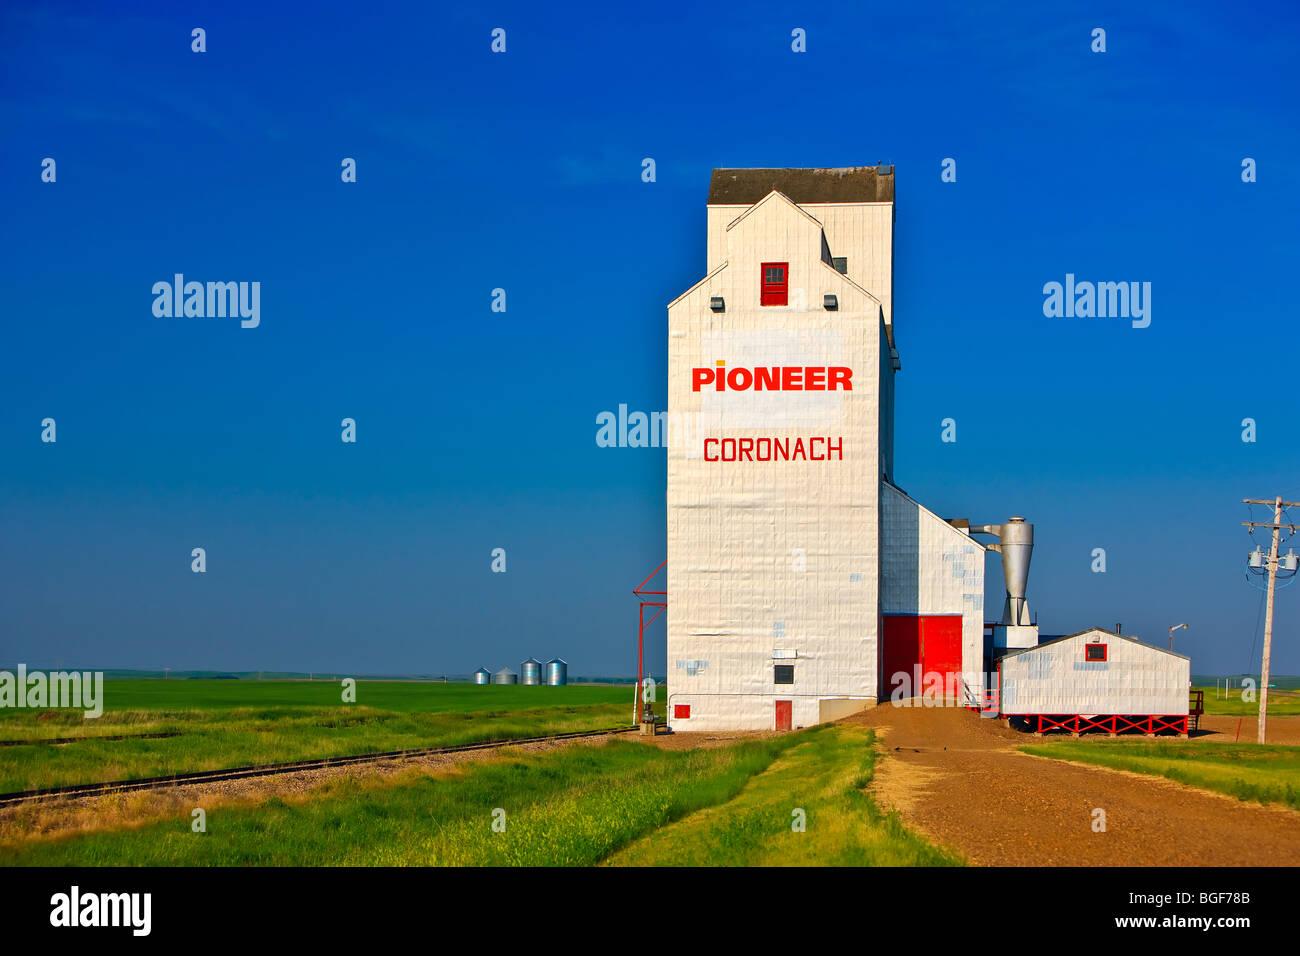 Grain elevator in the town of Coronach in the Big Muddy